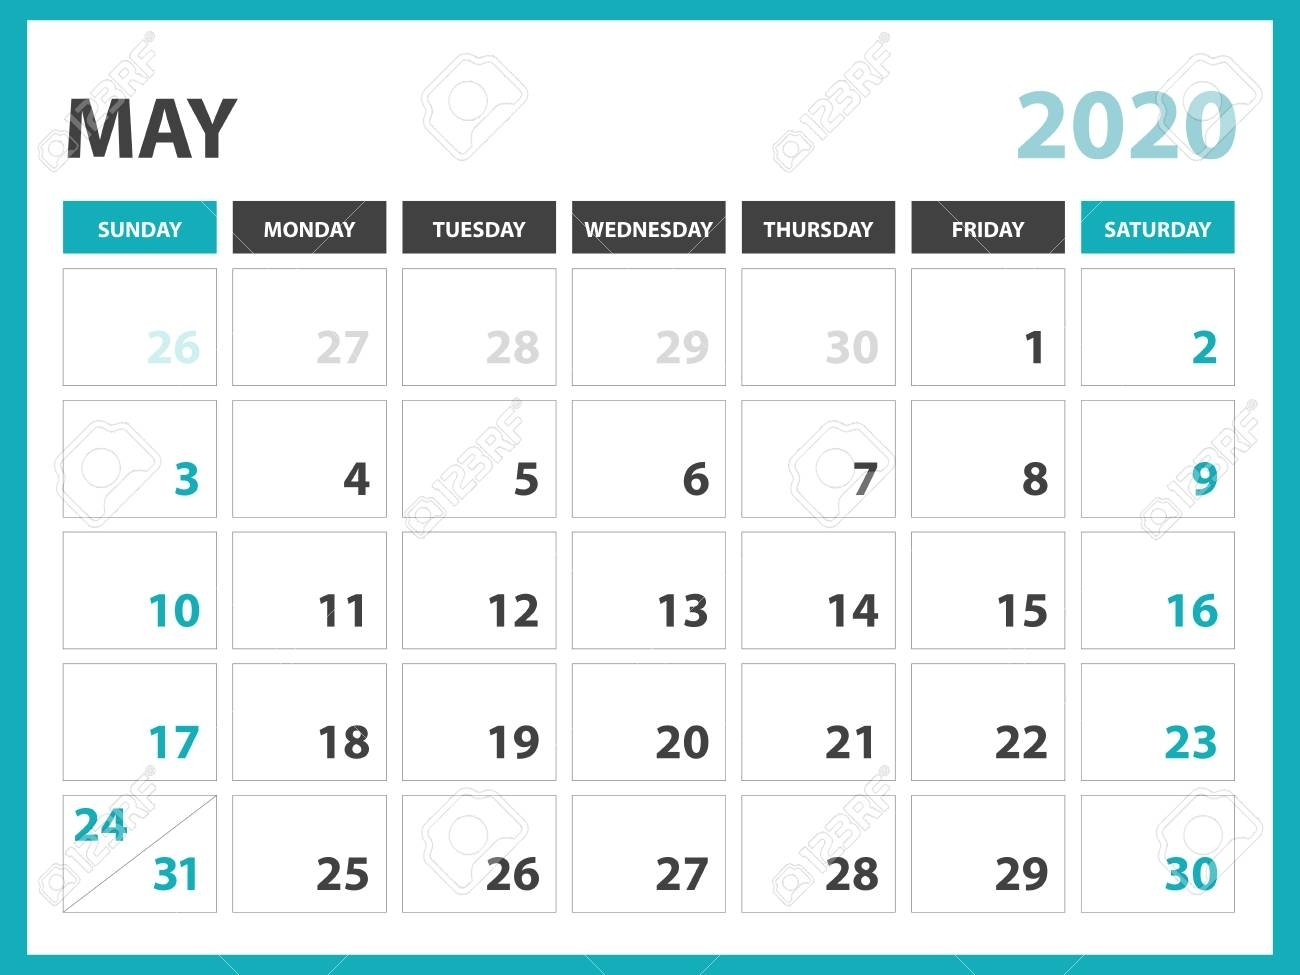 Desk Calendar Layout Size 8 X 6 Inch, May 2020 Calendar Template,..